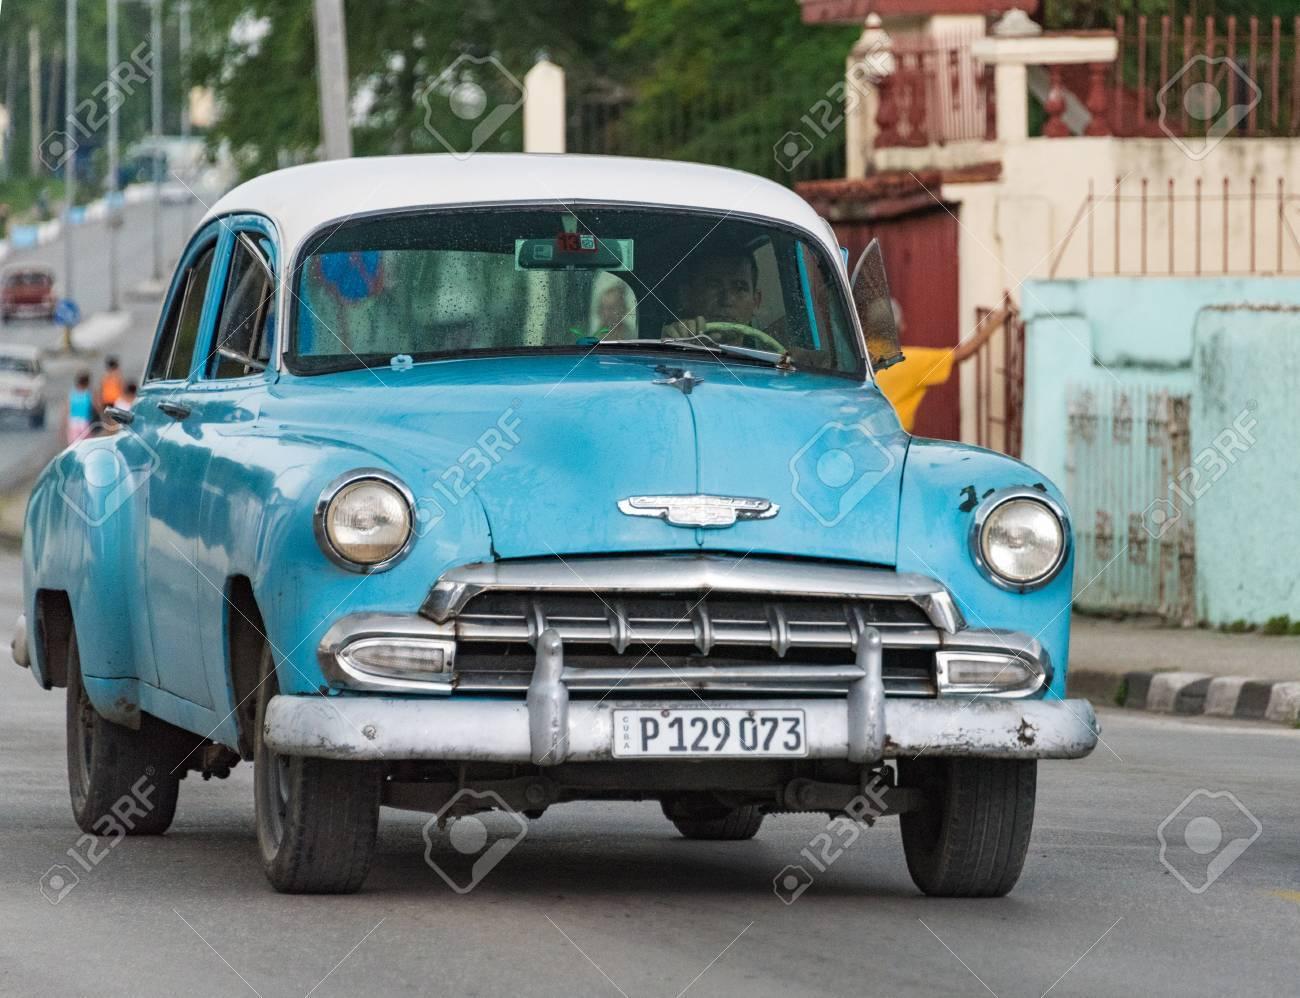 Tourism In Cuba: Old Vintage American Car In Santa Clara, Cuba. Cuba ...